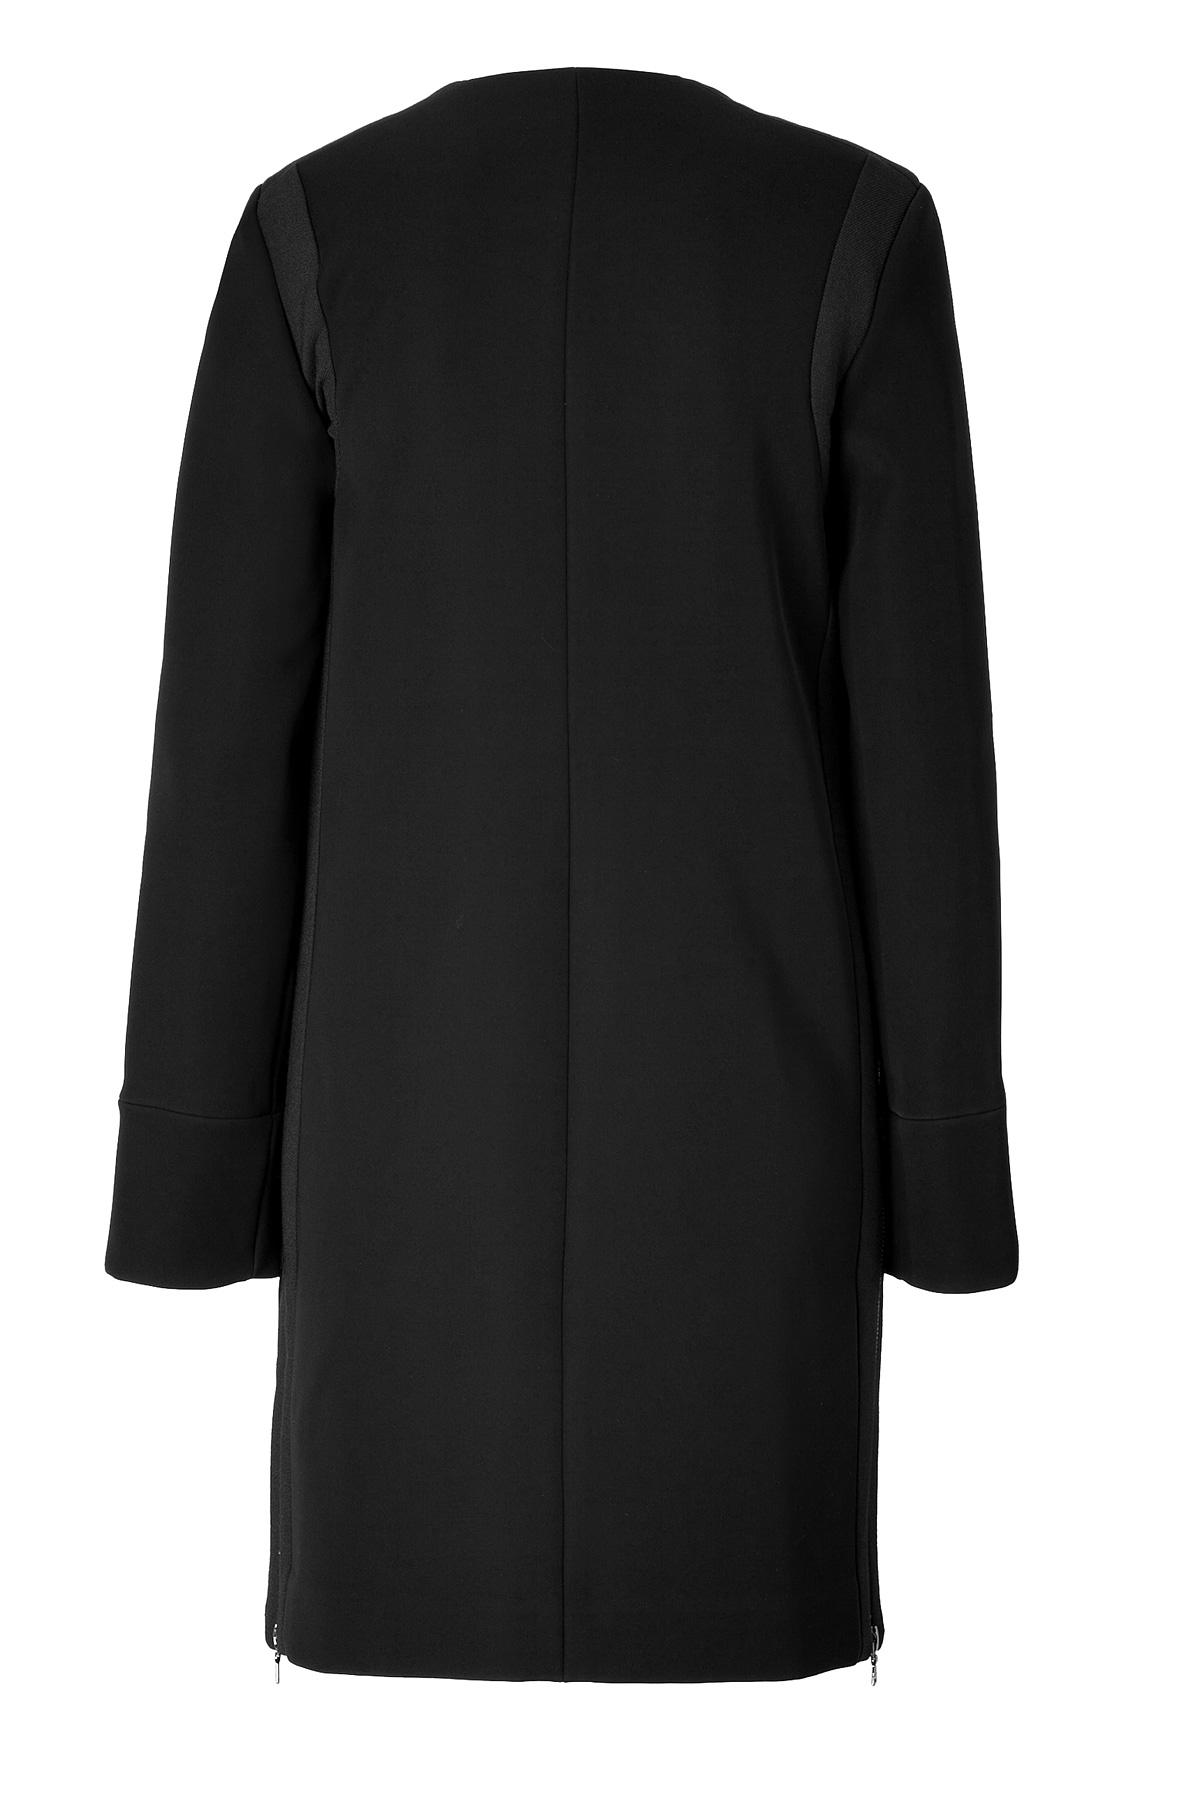 j brand florence coat - photo#2